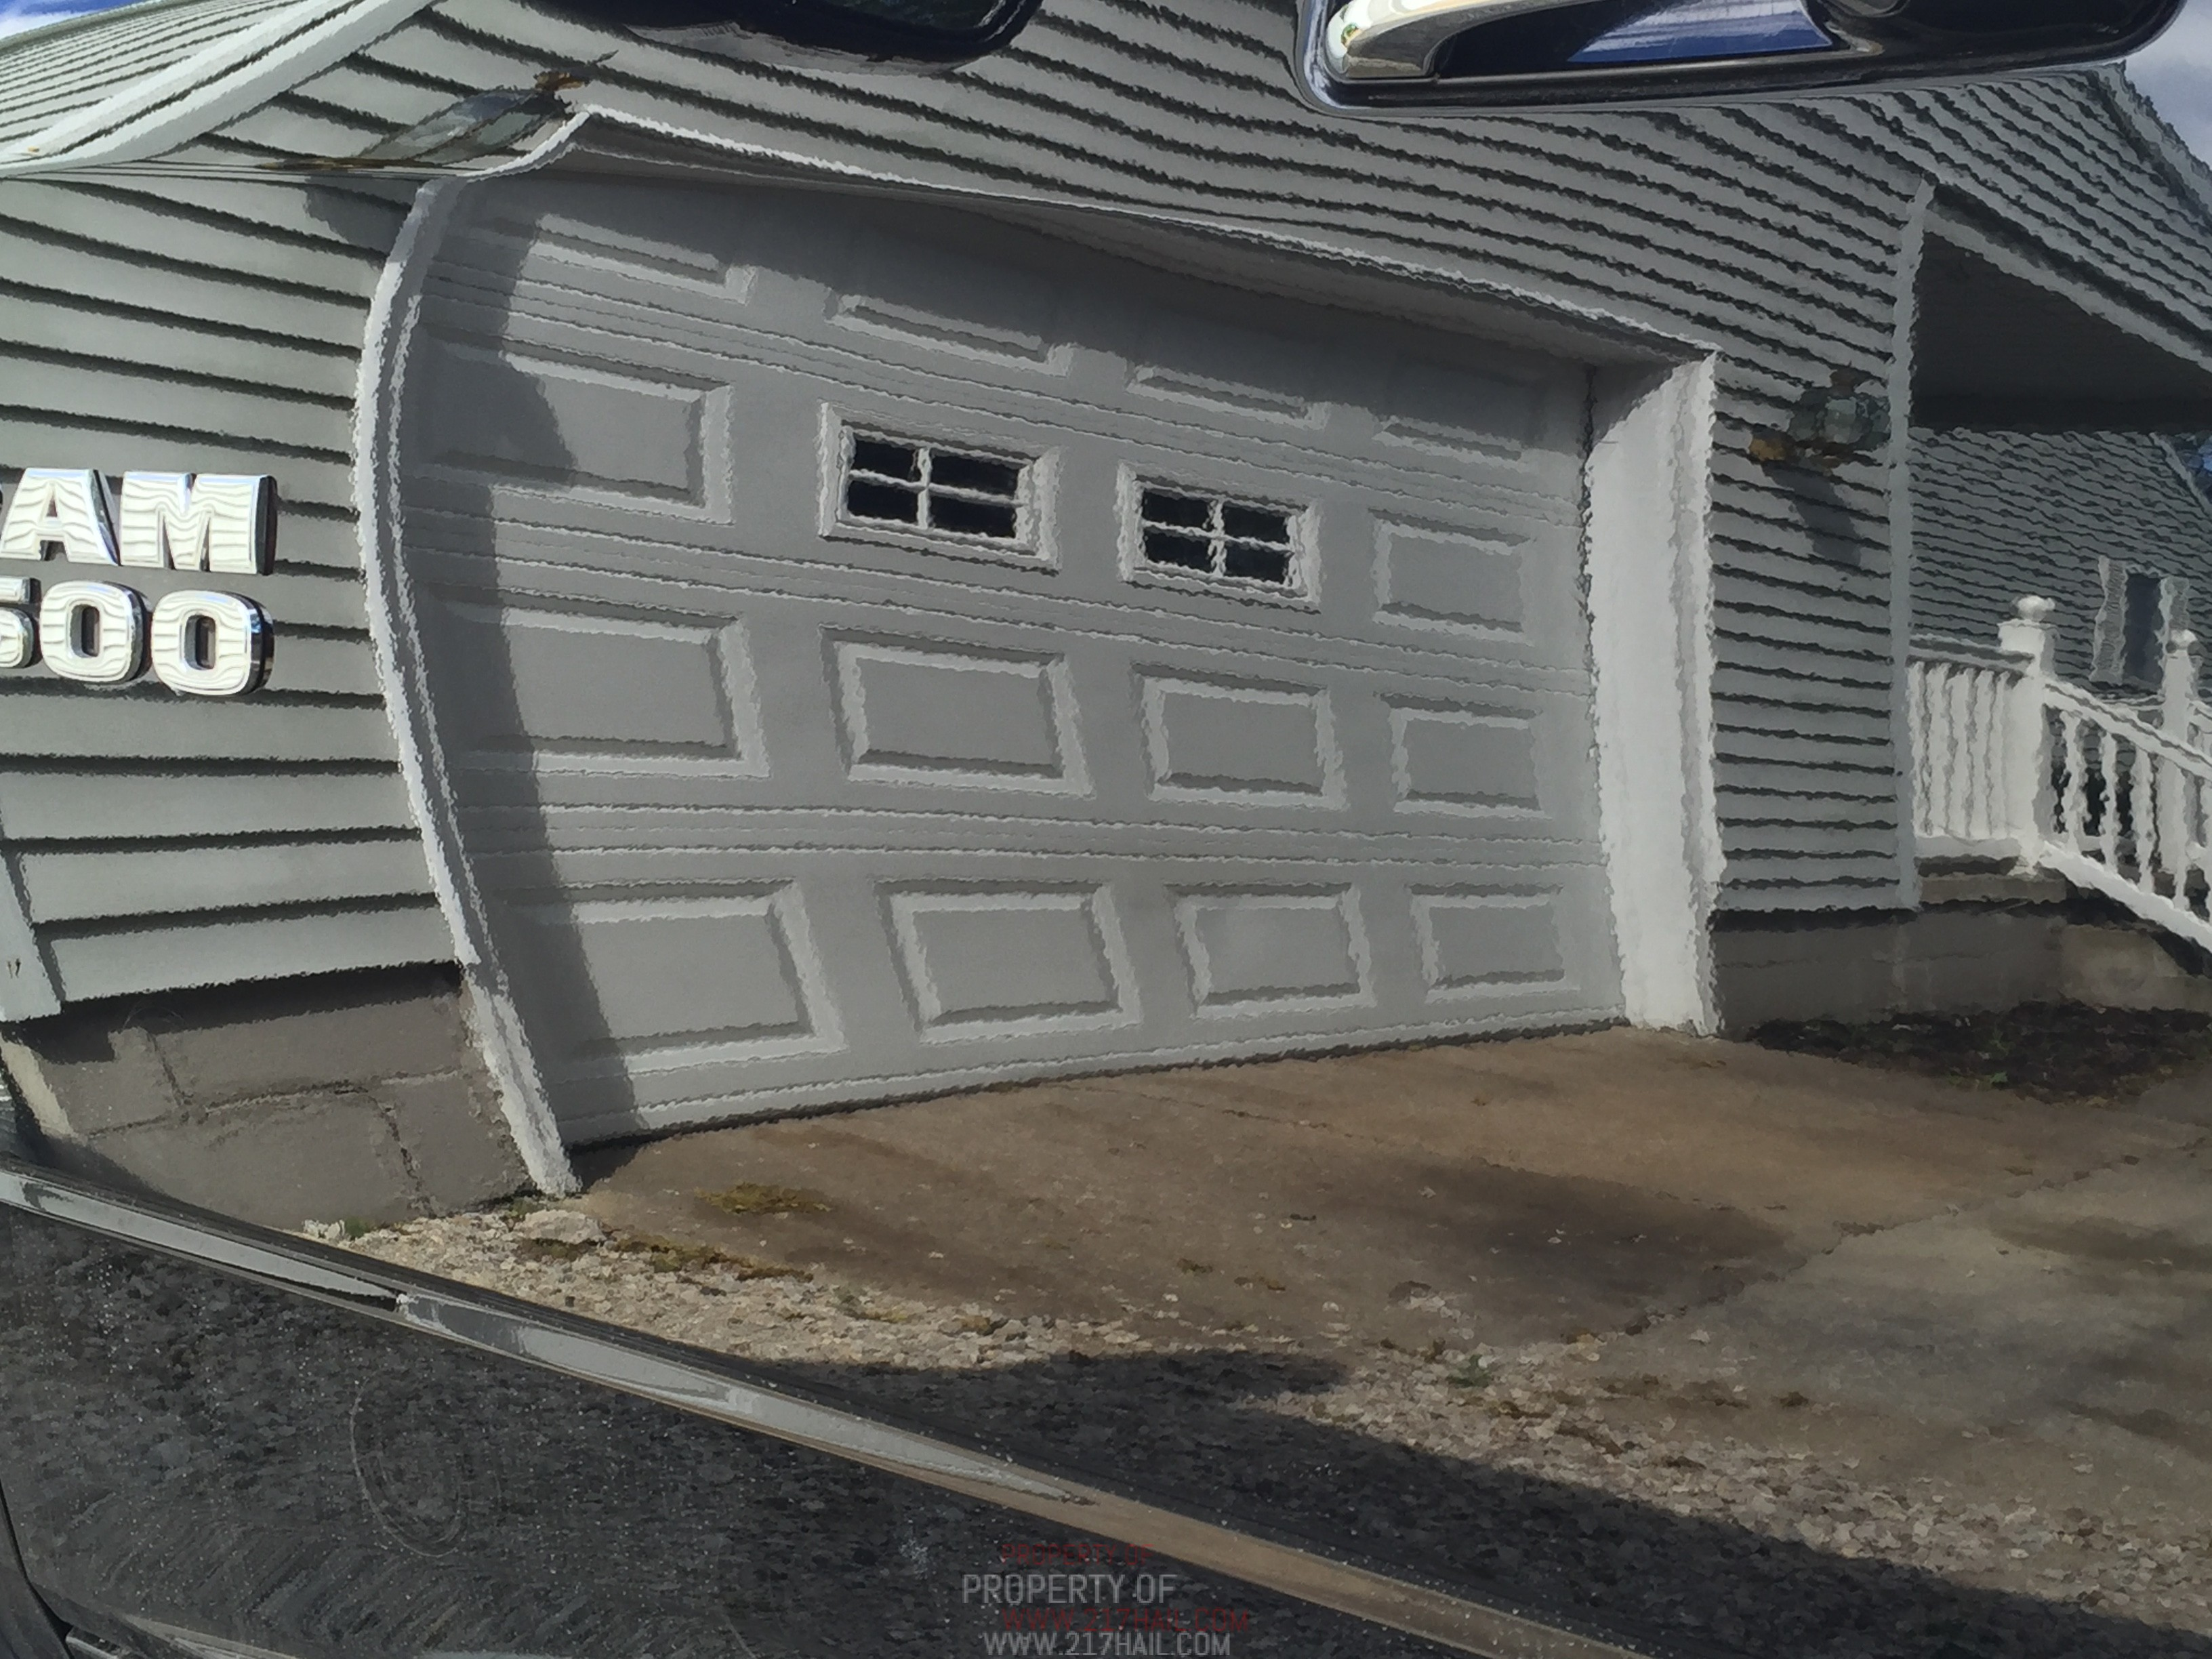 2013 Dodge Ram Drivers Door Dent Removal, Taylorville, IL. Springfield, IL. Mobile Dent repair, http://217dent.com